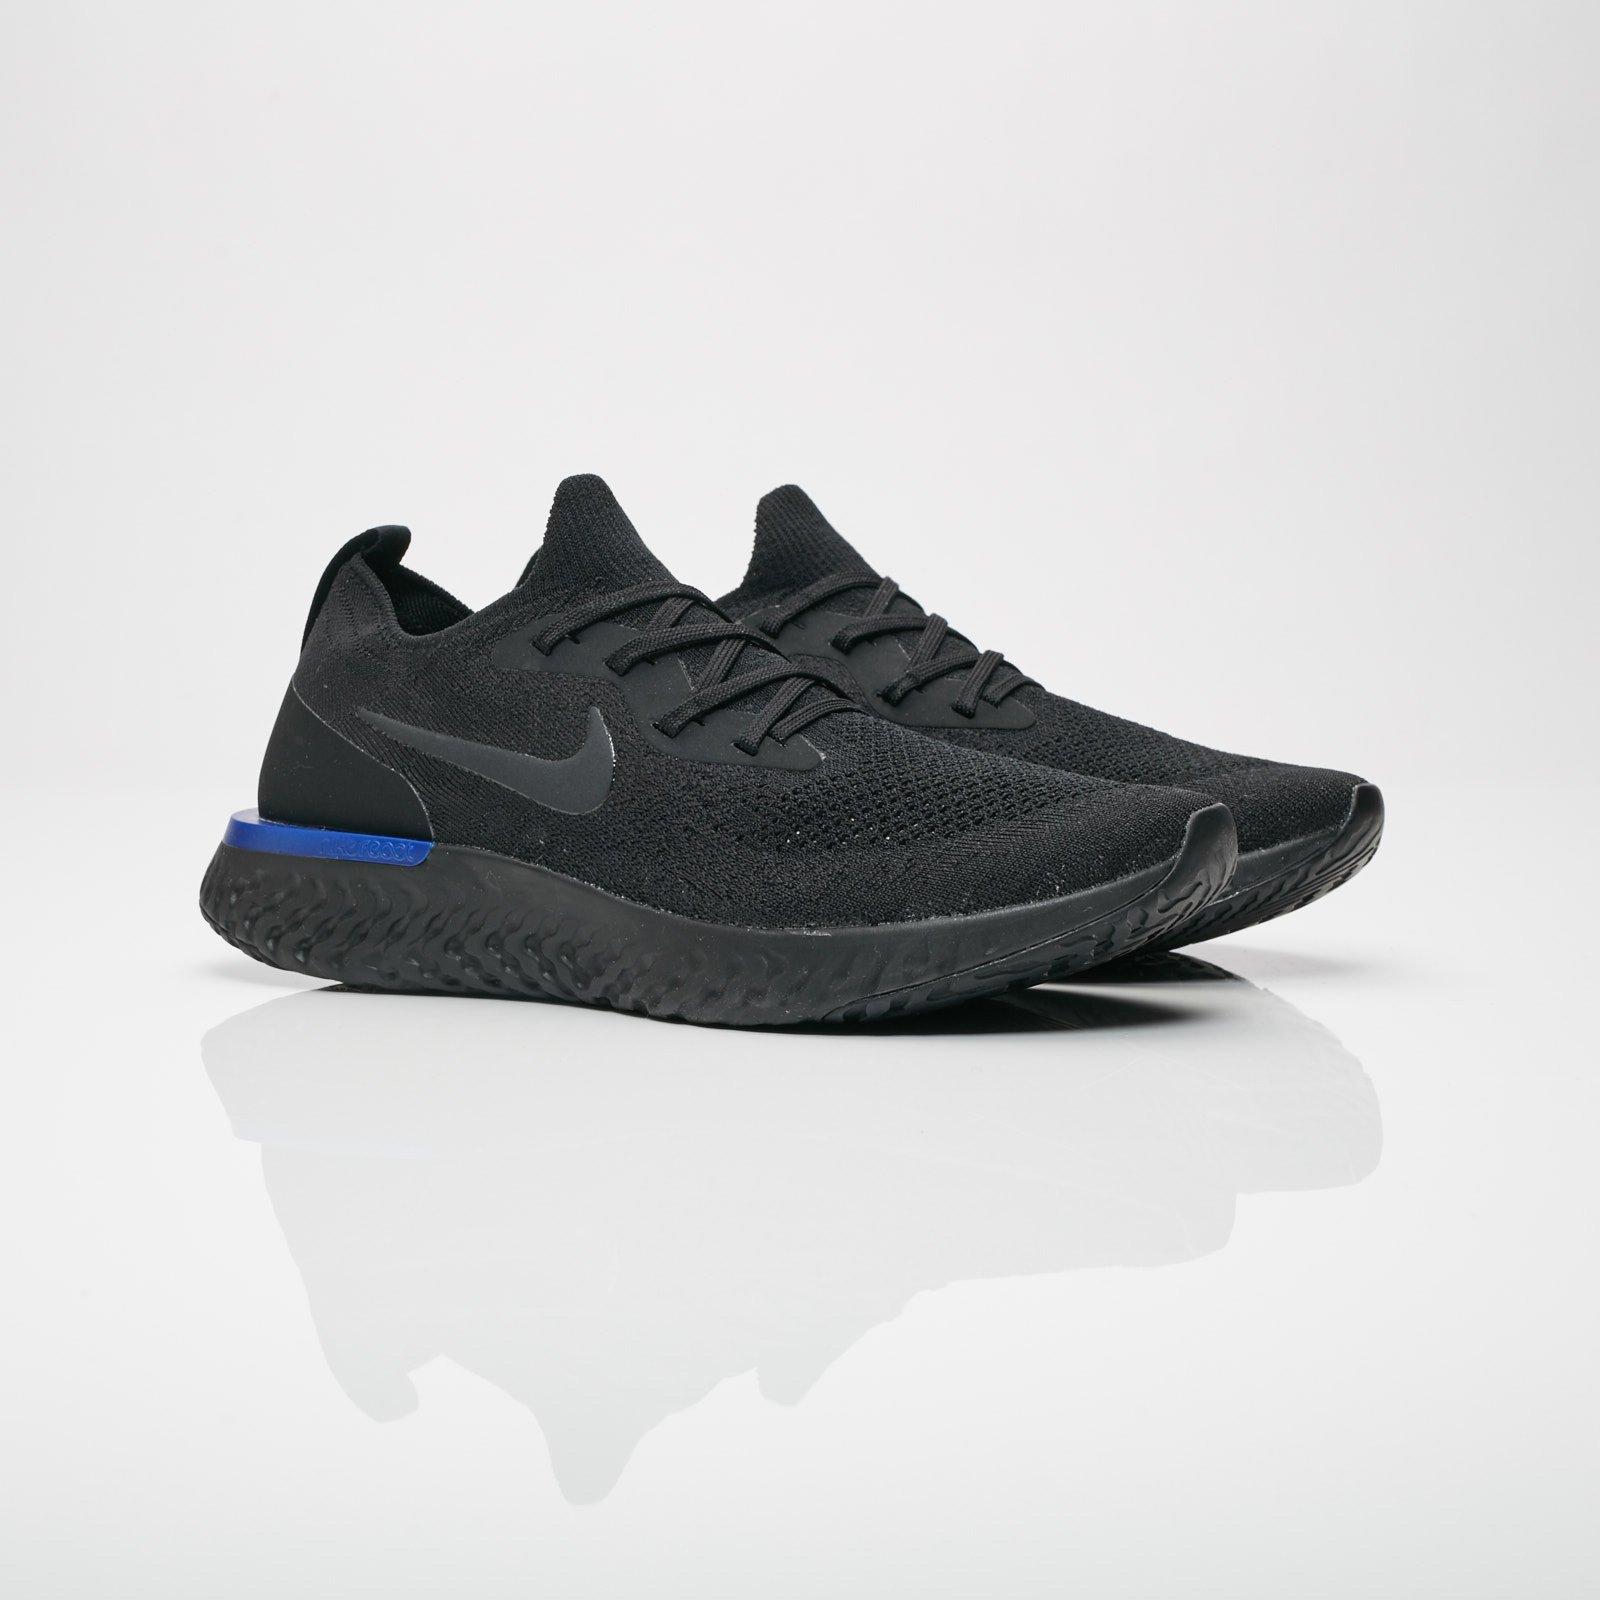 Nike Epic React Flyknit - Aq0067-004